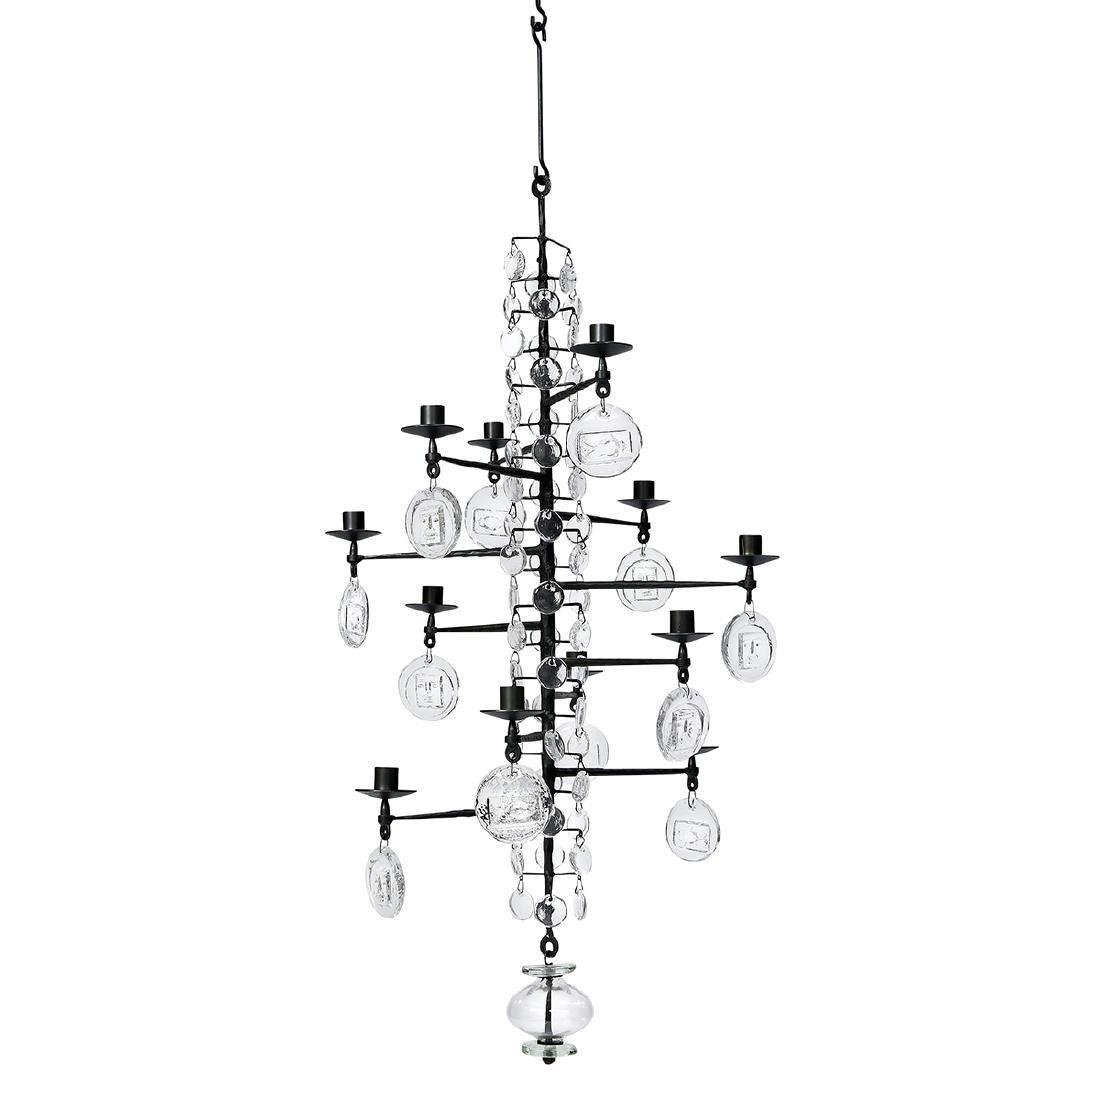 Erik Hoglund for Boda Smide AB 12-light chandelier